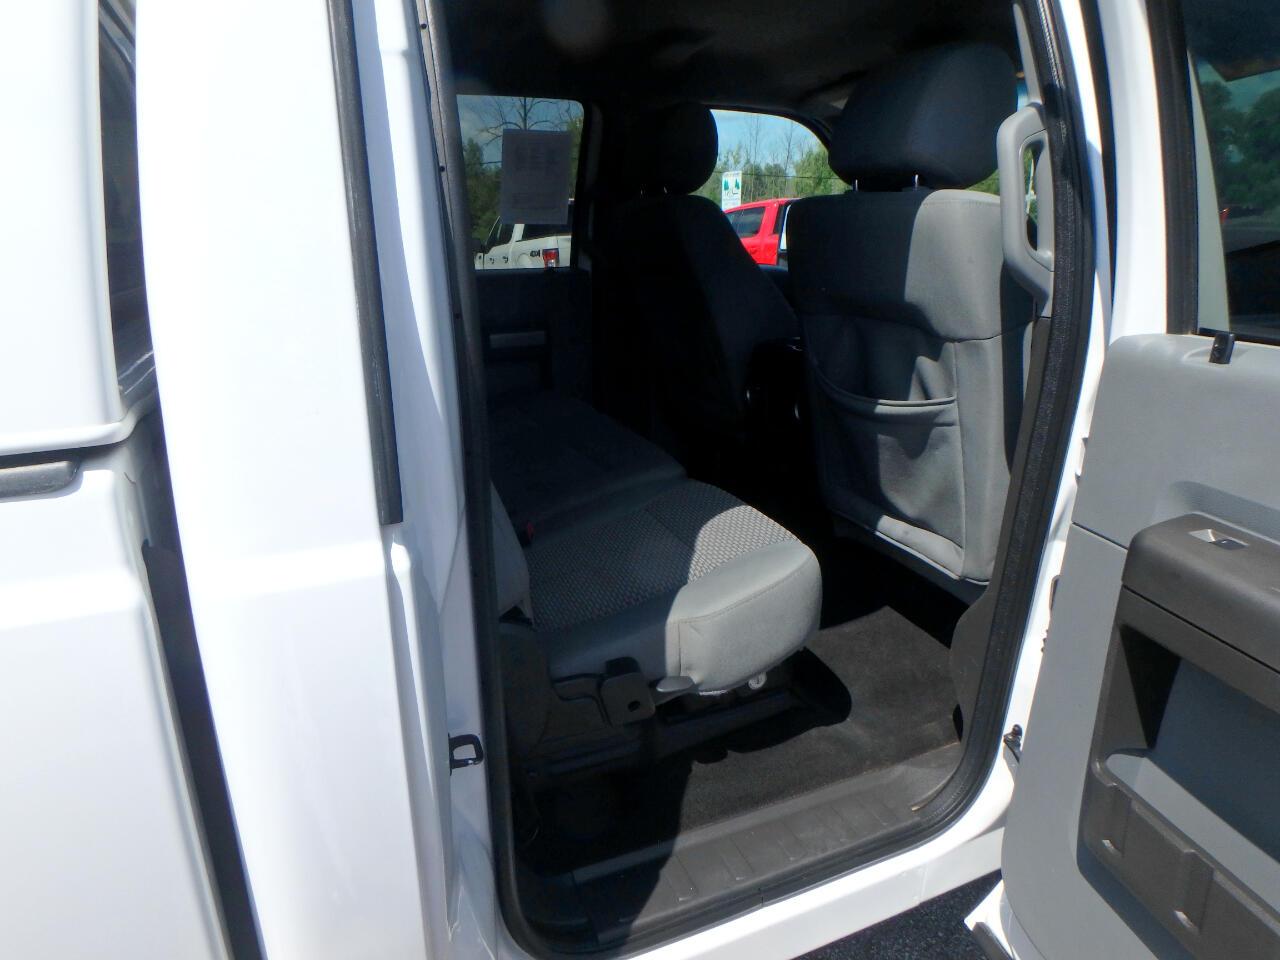 2014 Ford Super Duty F-250 SRW XLT 4WD Crew Cab 6.75' Box